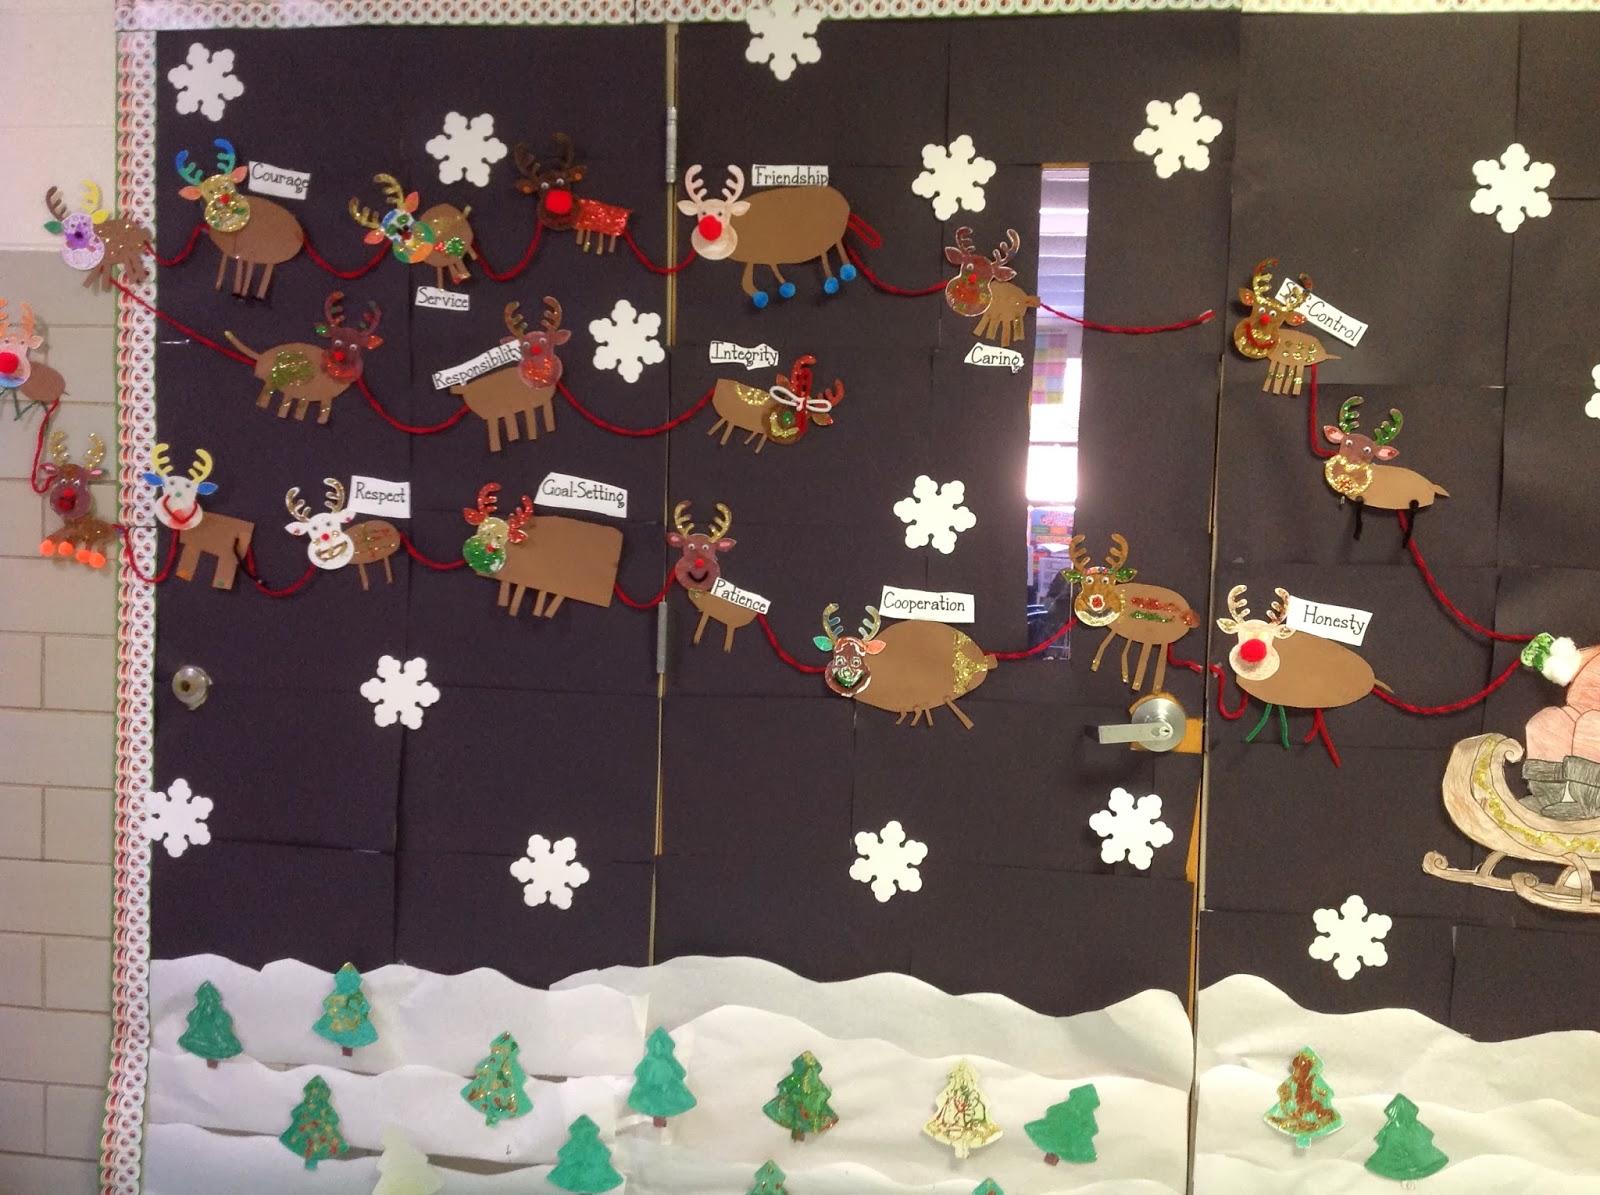 Kennedy S Classroom Character Door Decorating Contest